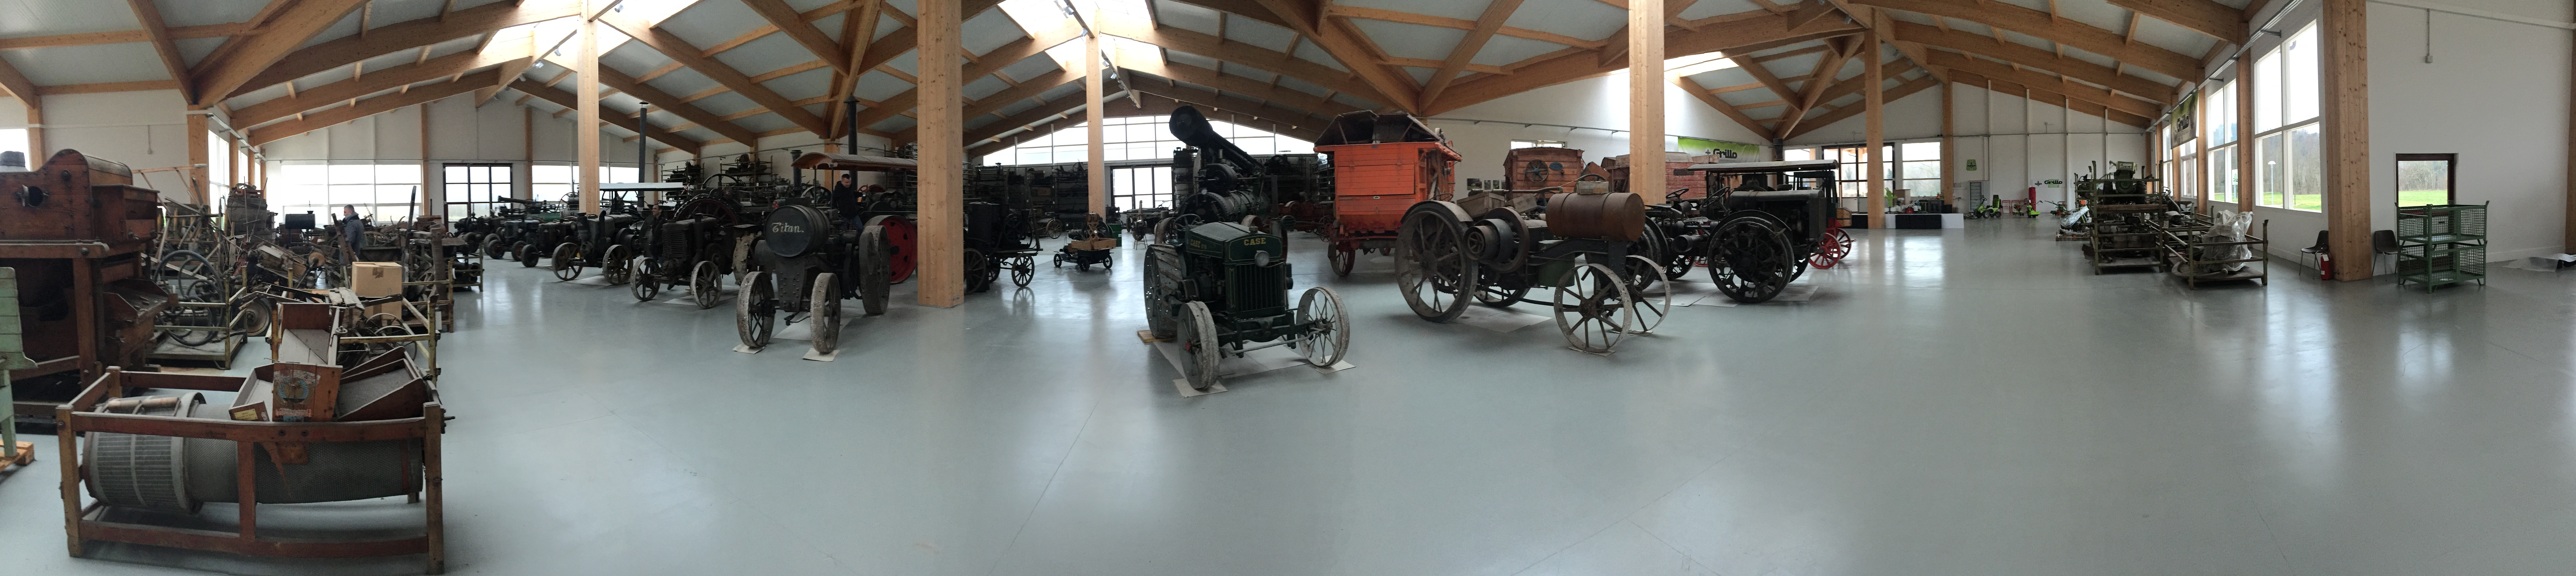 Fabryka Grillo stare maszyny